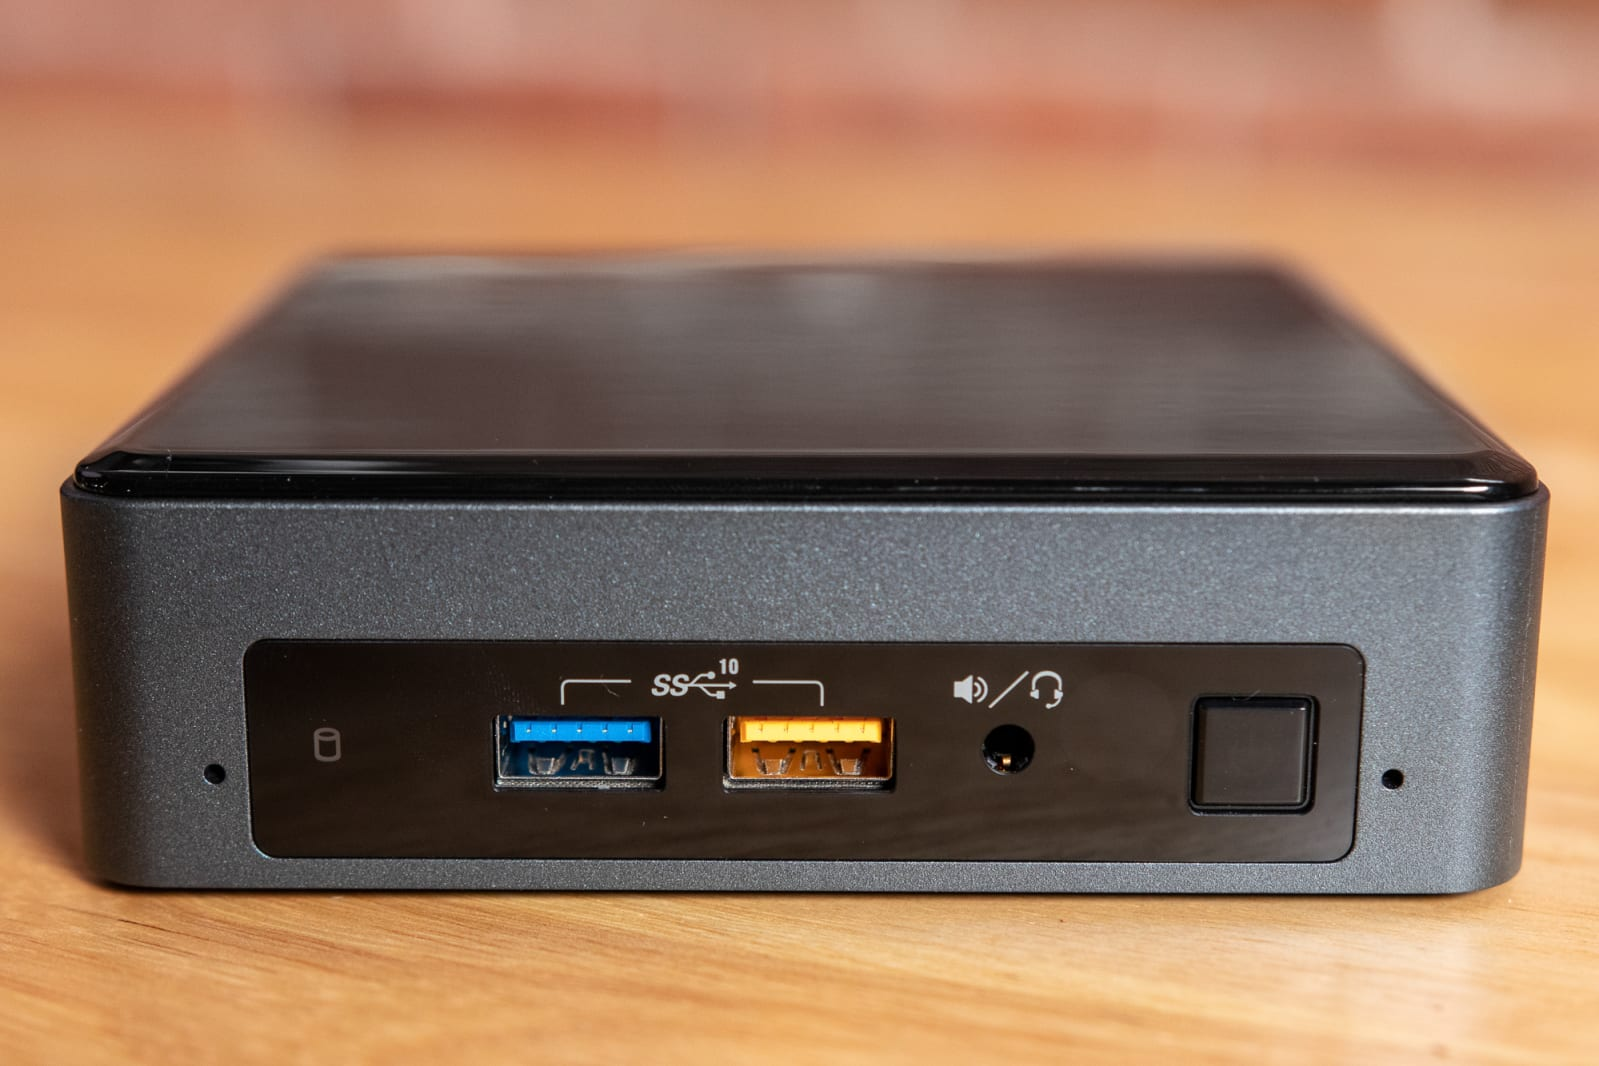 Mini desktop PC